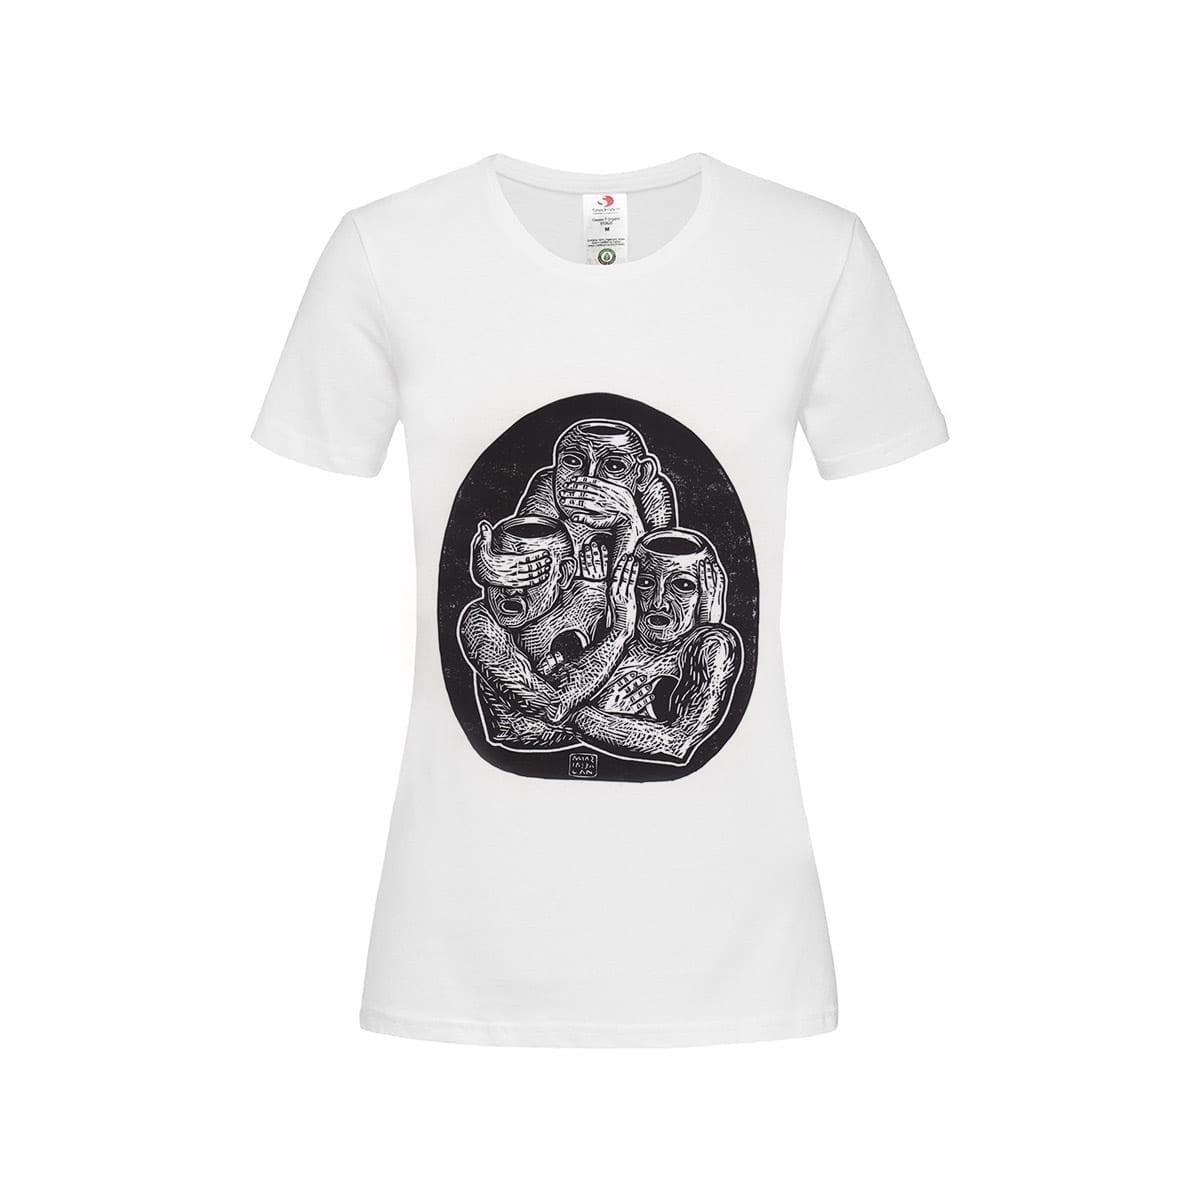 Three Unwise Humans manual linocut printed Womens' T-Shirt by Maria Bălan